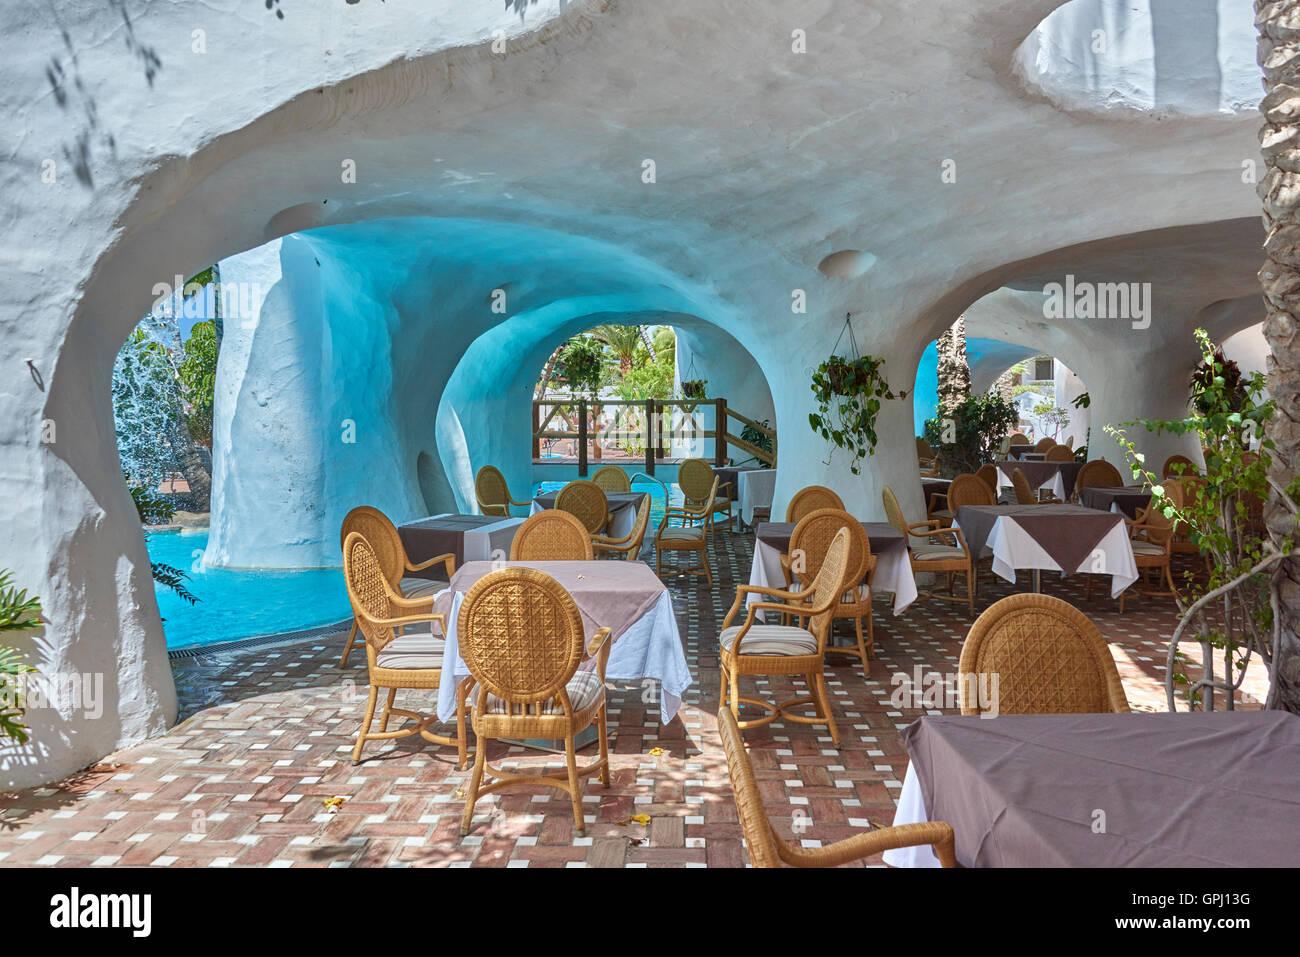 Hotel Jardin Tropical Costa Adeje Tenerife Banque D Images Photo